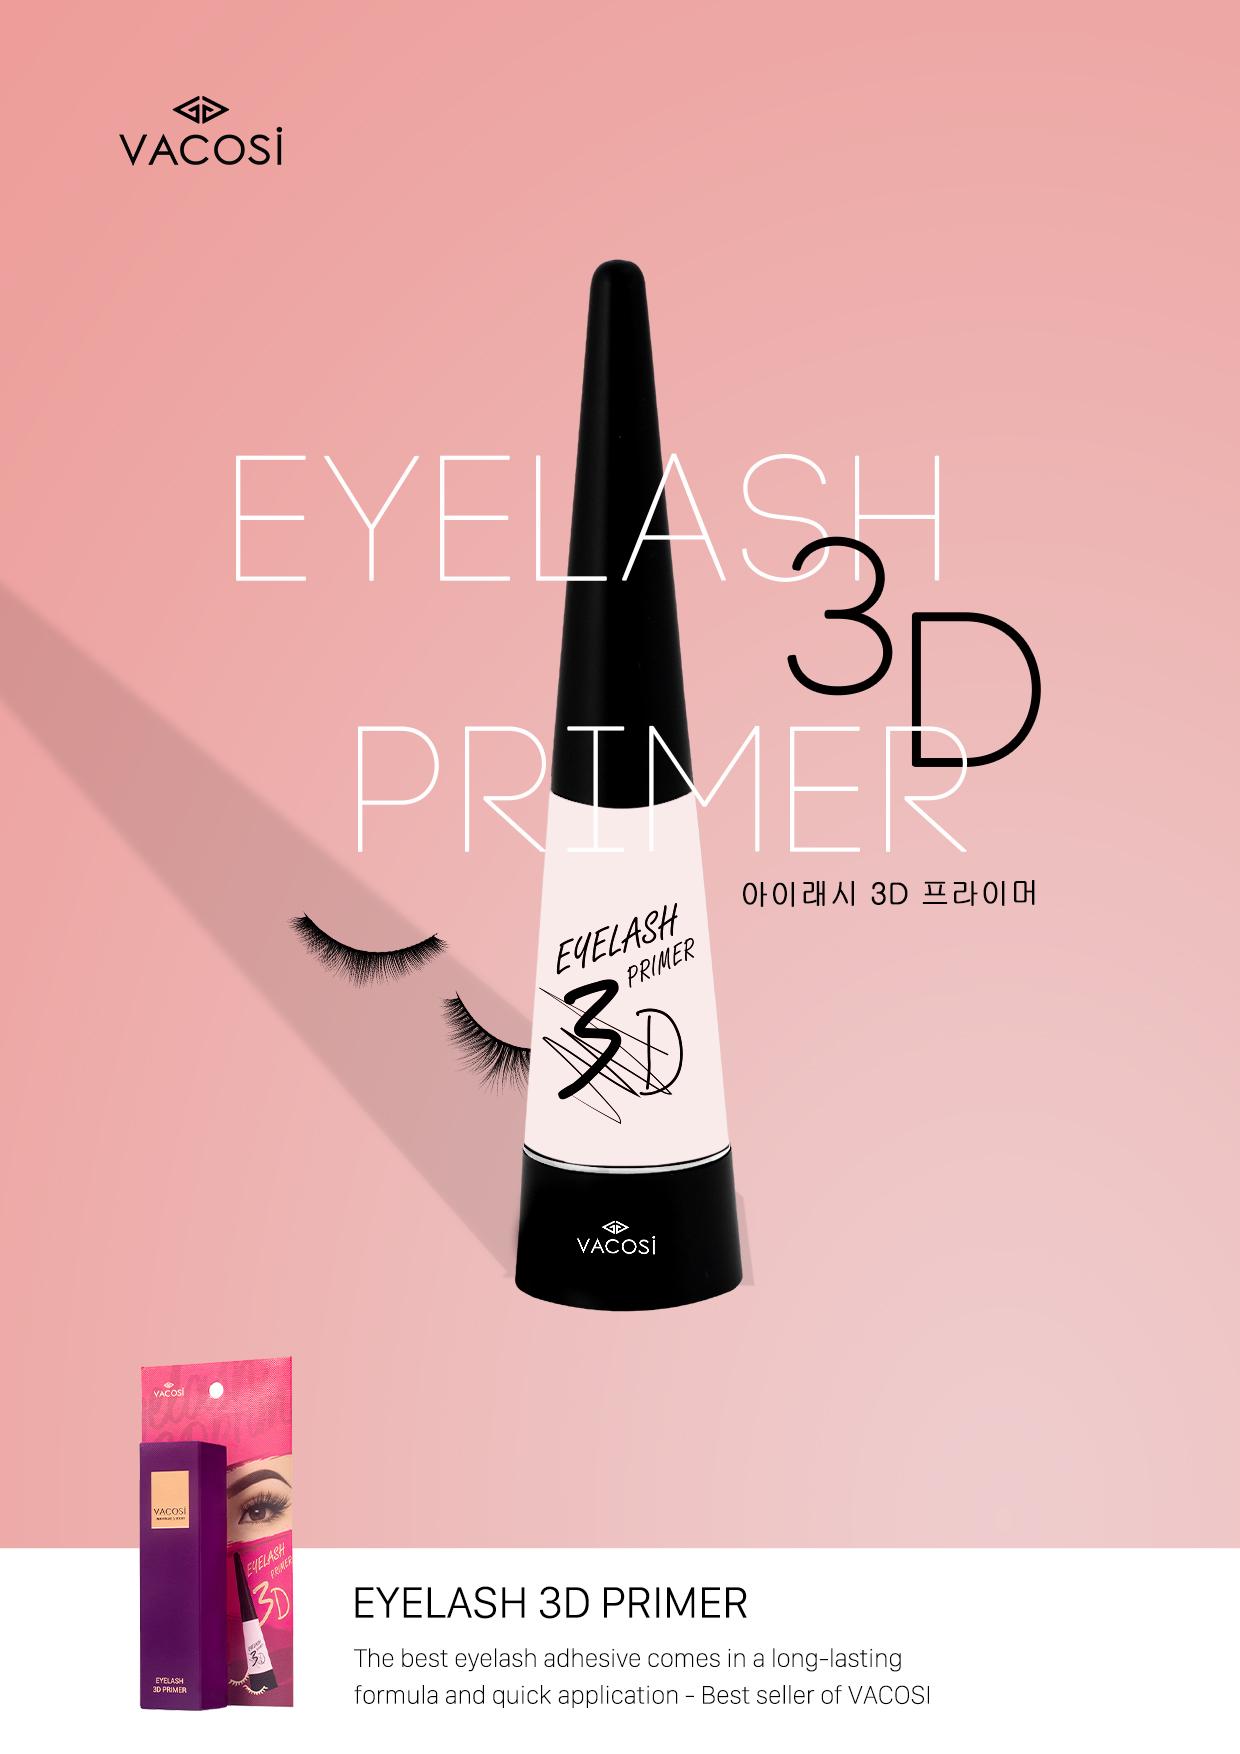 ACC Keo Dán Mi Giả Vacosi Eyelash 3D Primer - VM12